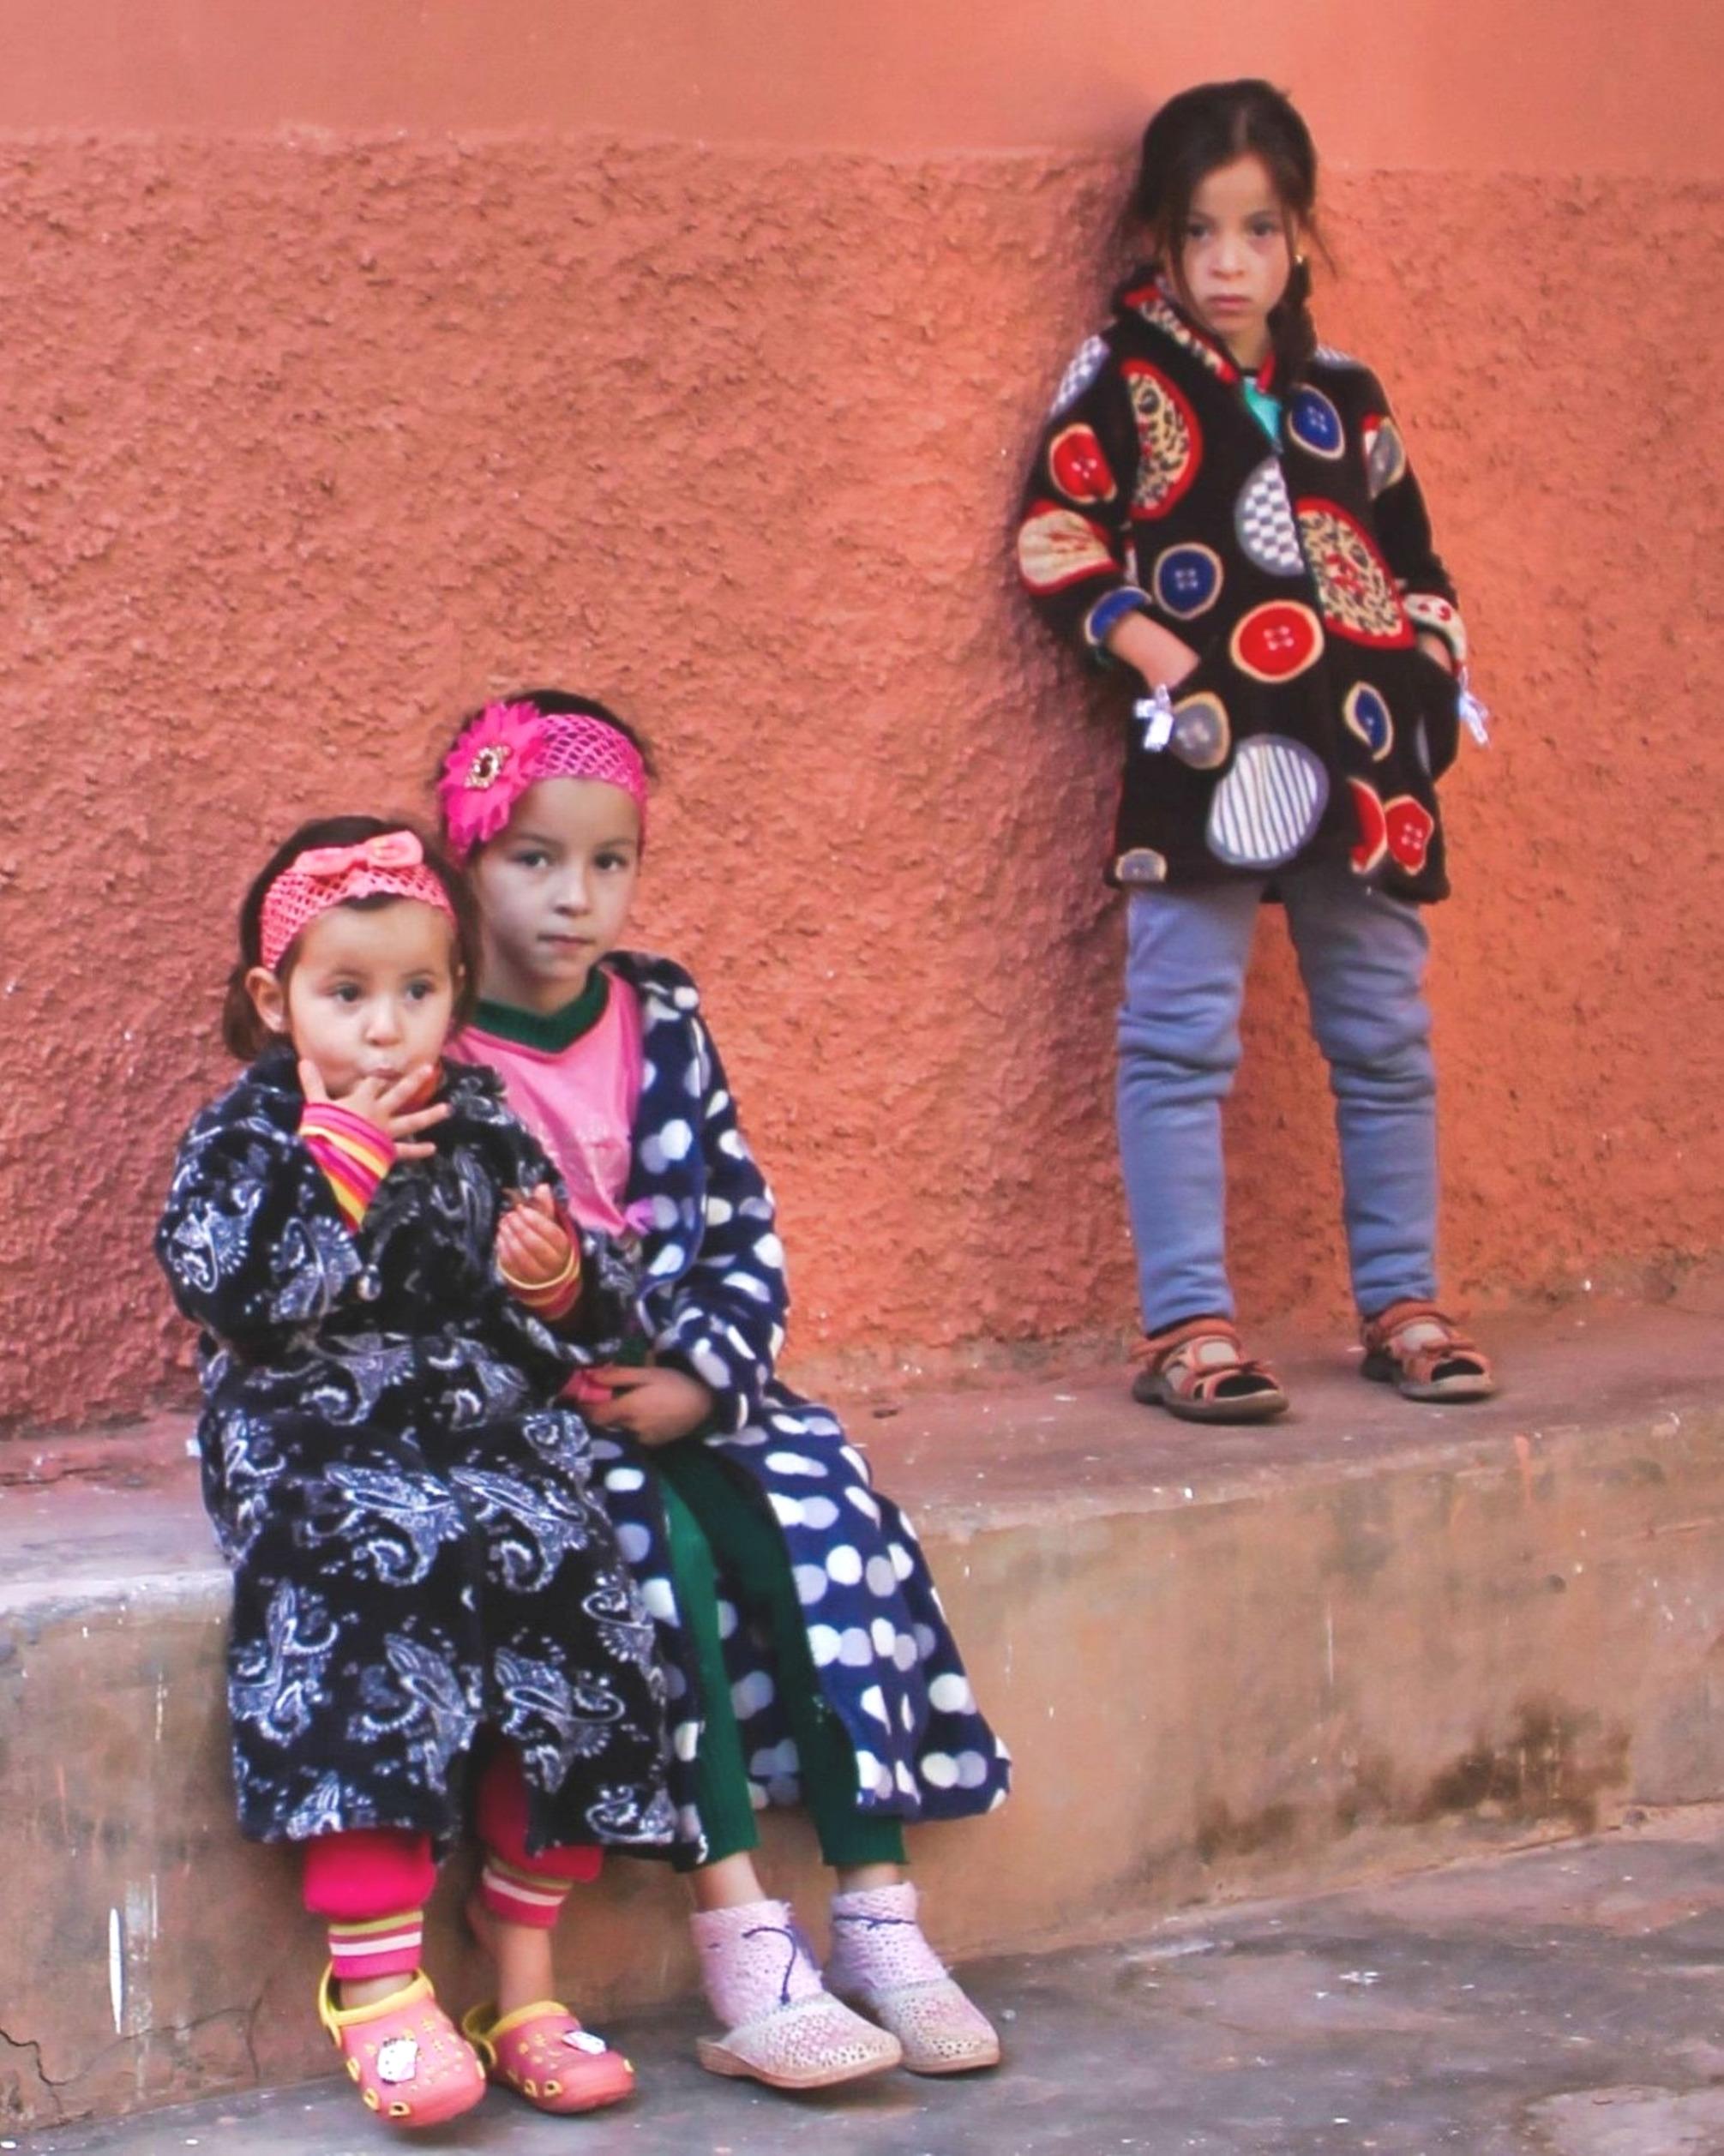 Leo tujak 3 moroccan girls.jpg o5kdmi